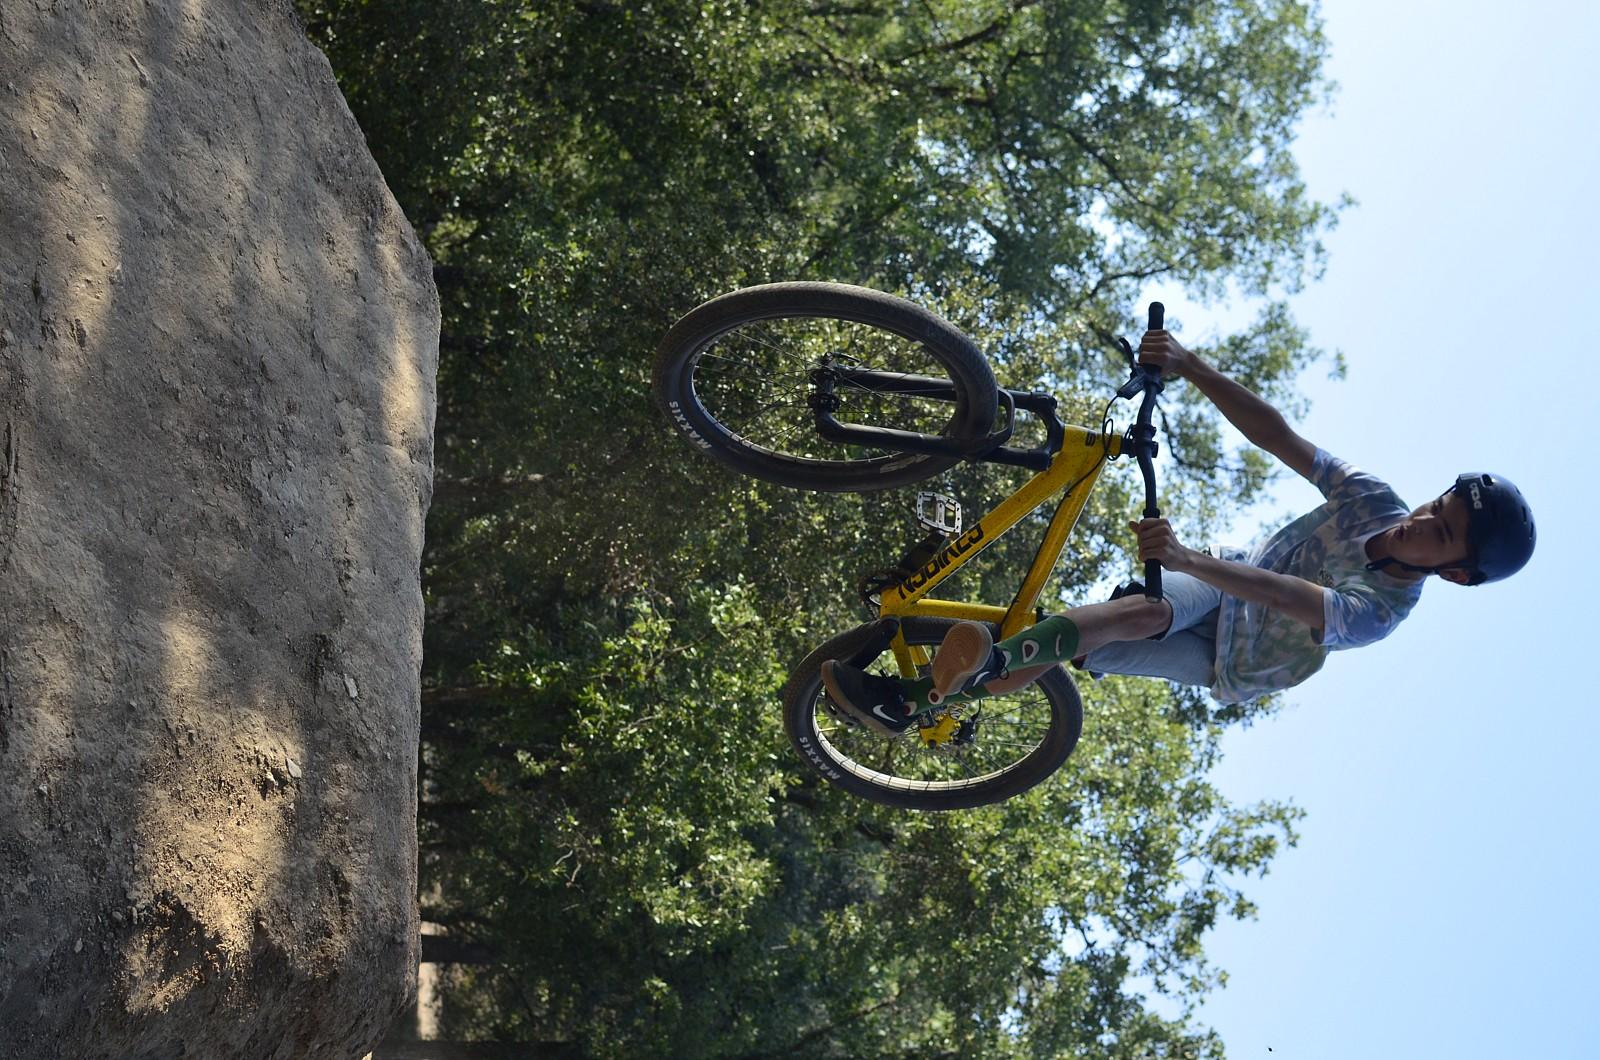 DSC0061 - iguelgonz - Mountain Biking Pictures - Vital MTB